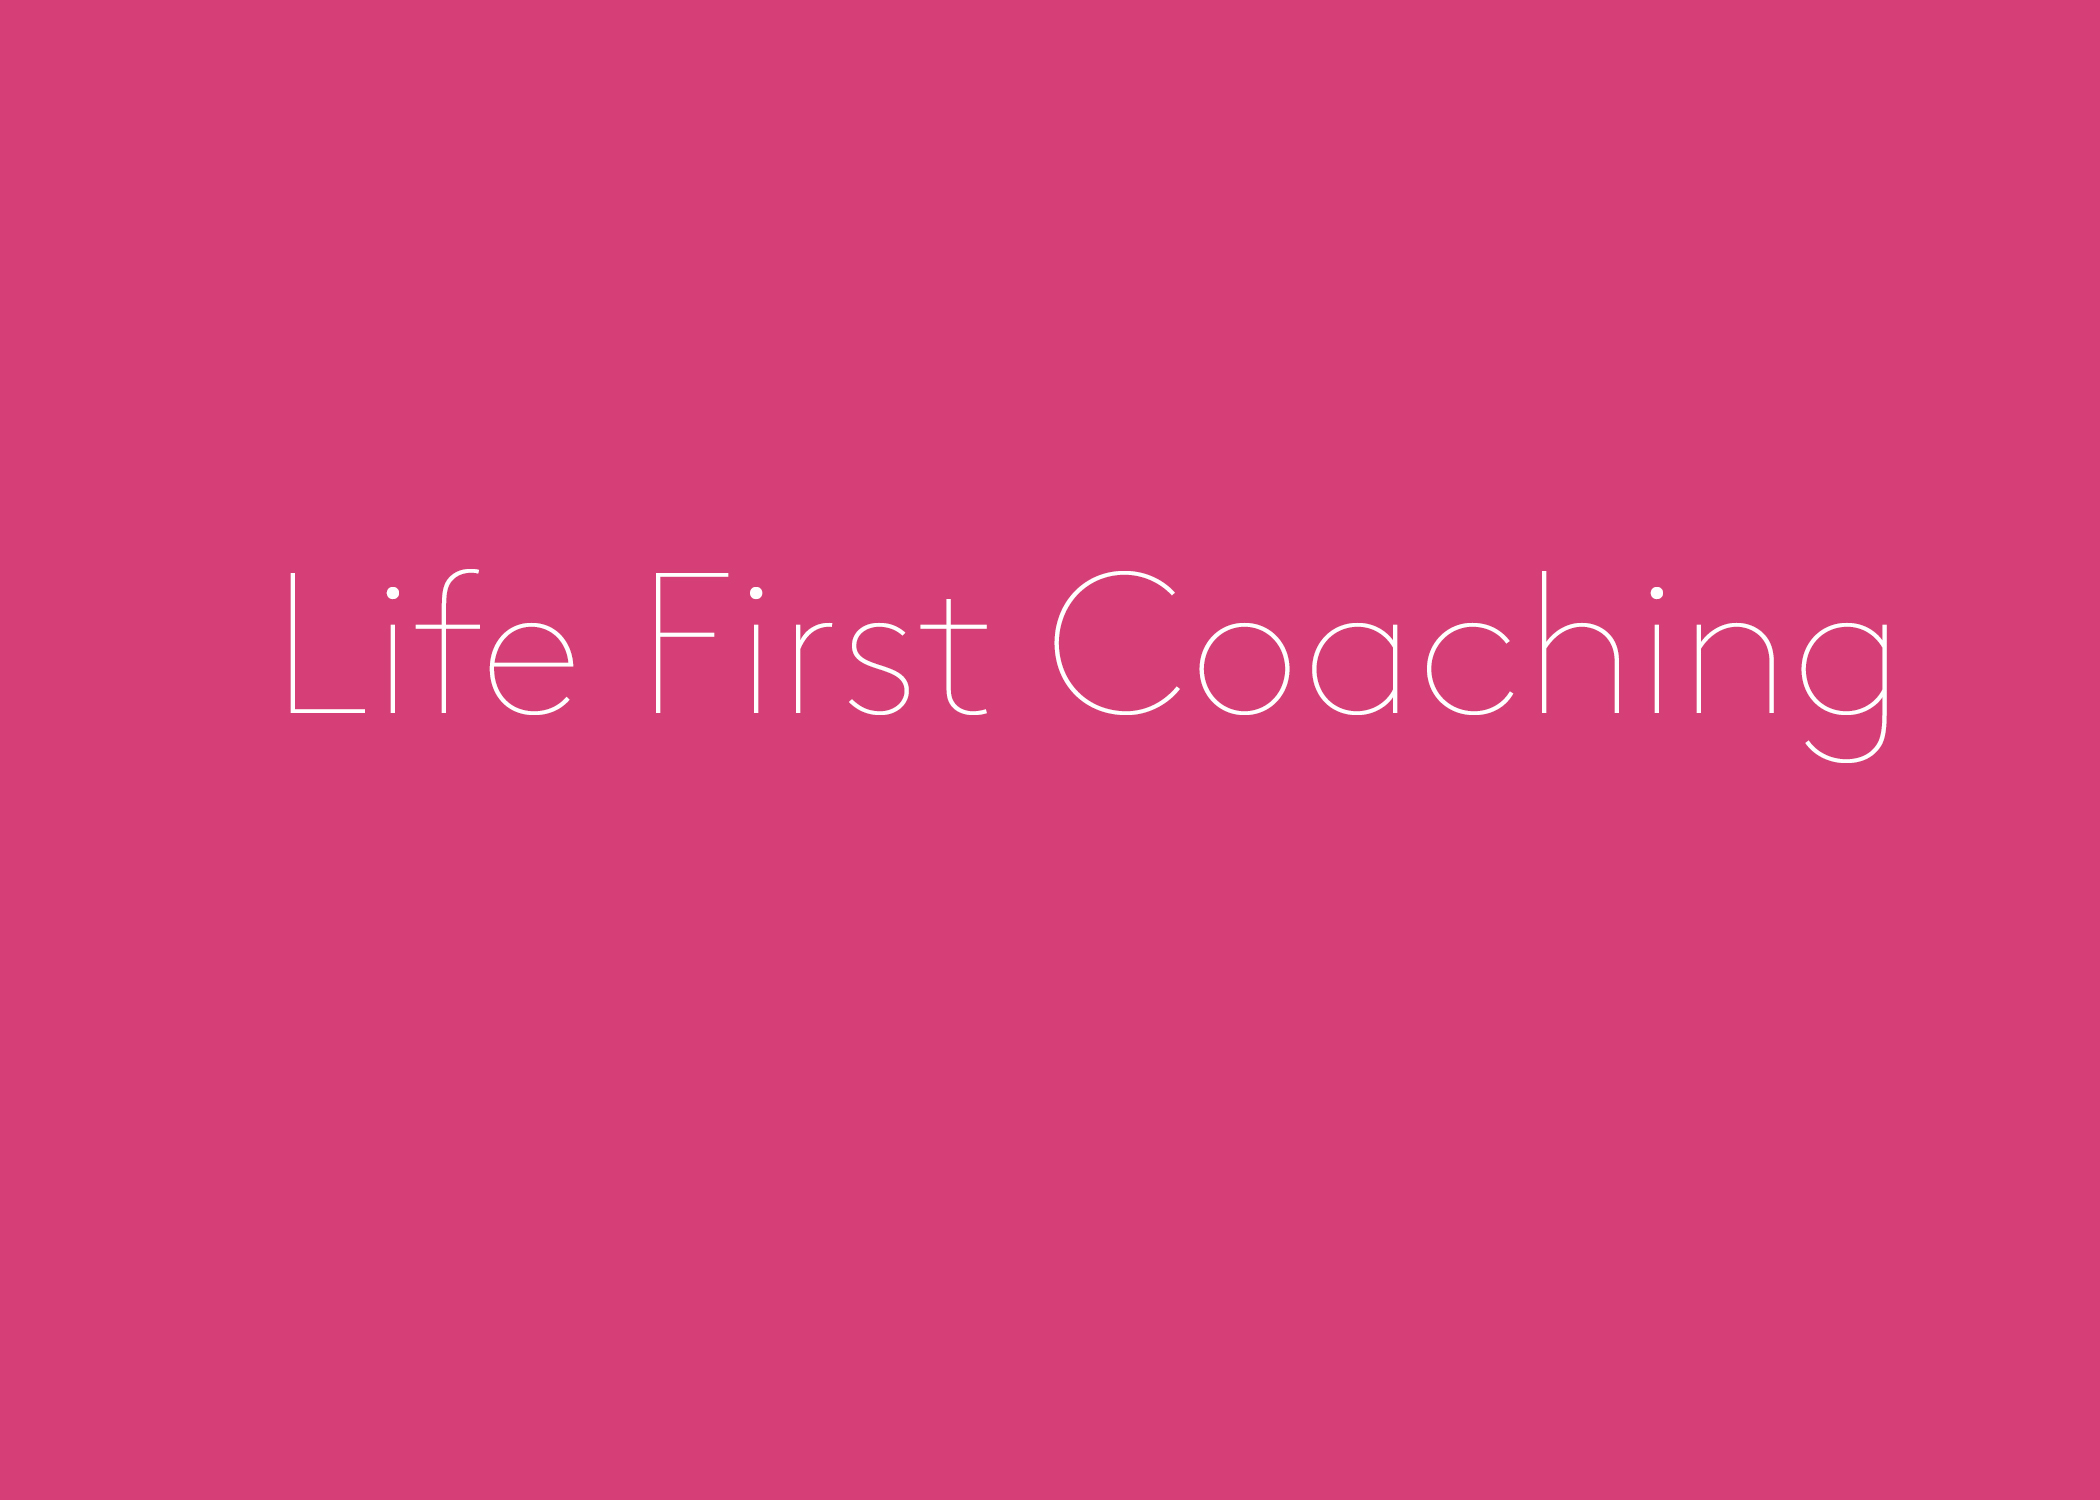 life first coaching.jpg